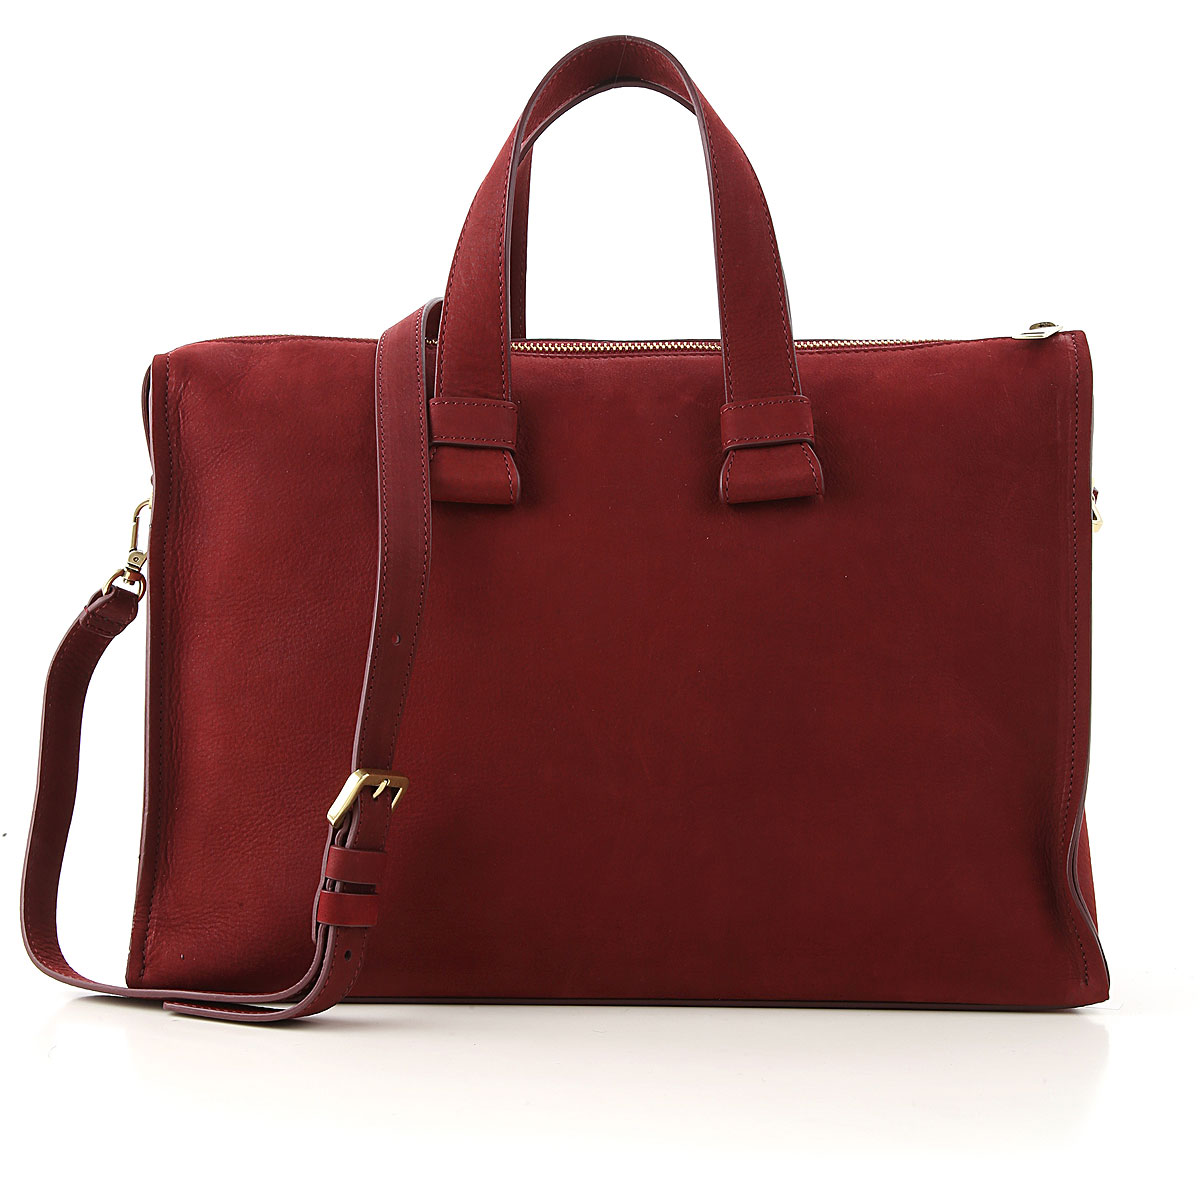 Orciani Top Handle Handbag On Sale, Dark Ruby, Suede leather, 2019